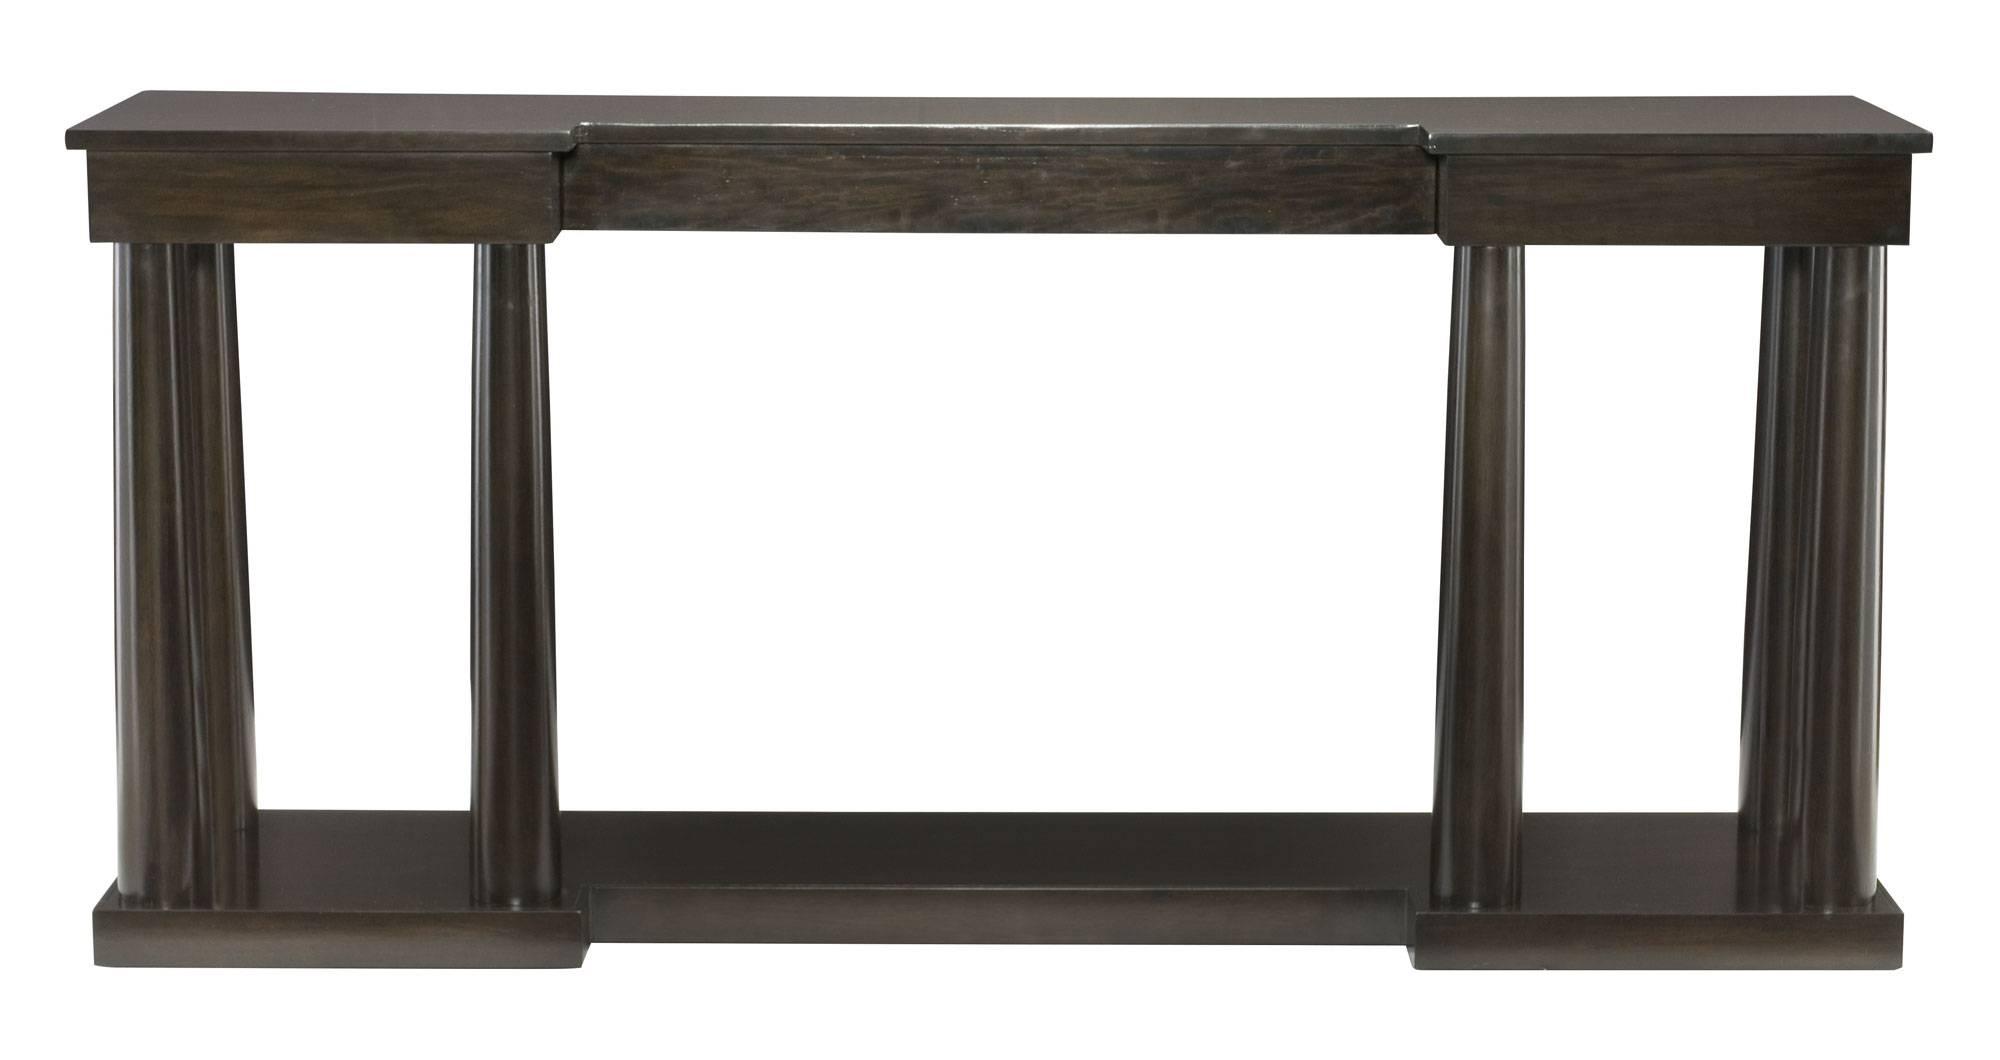 Console Table | Bernhardt regarding Bernhardt Console Tables (Image 10 of 15)